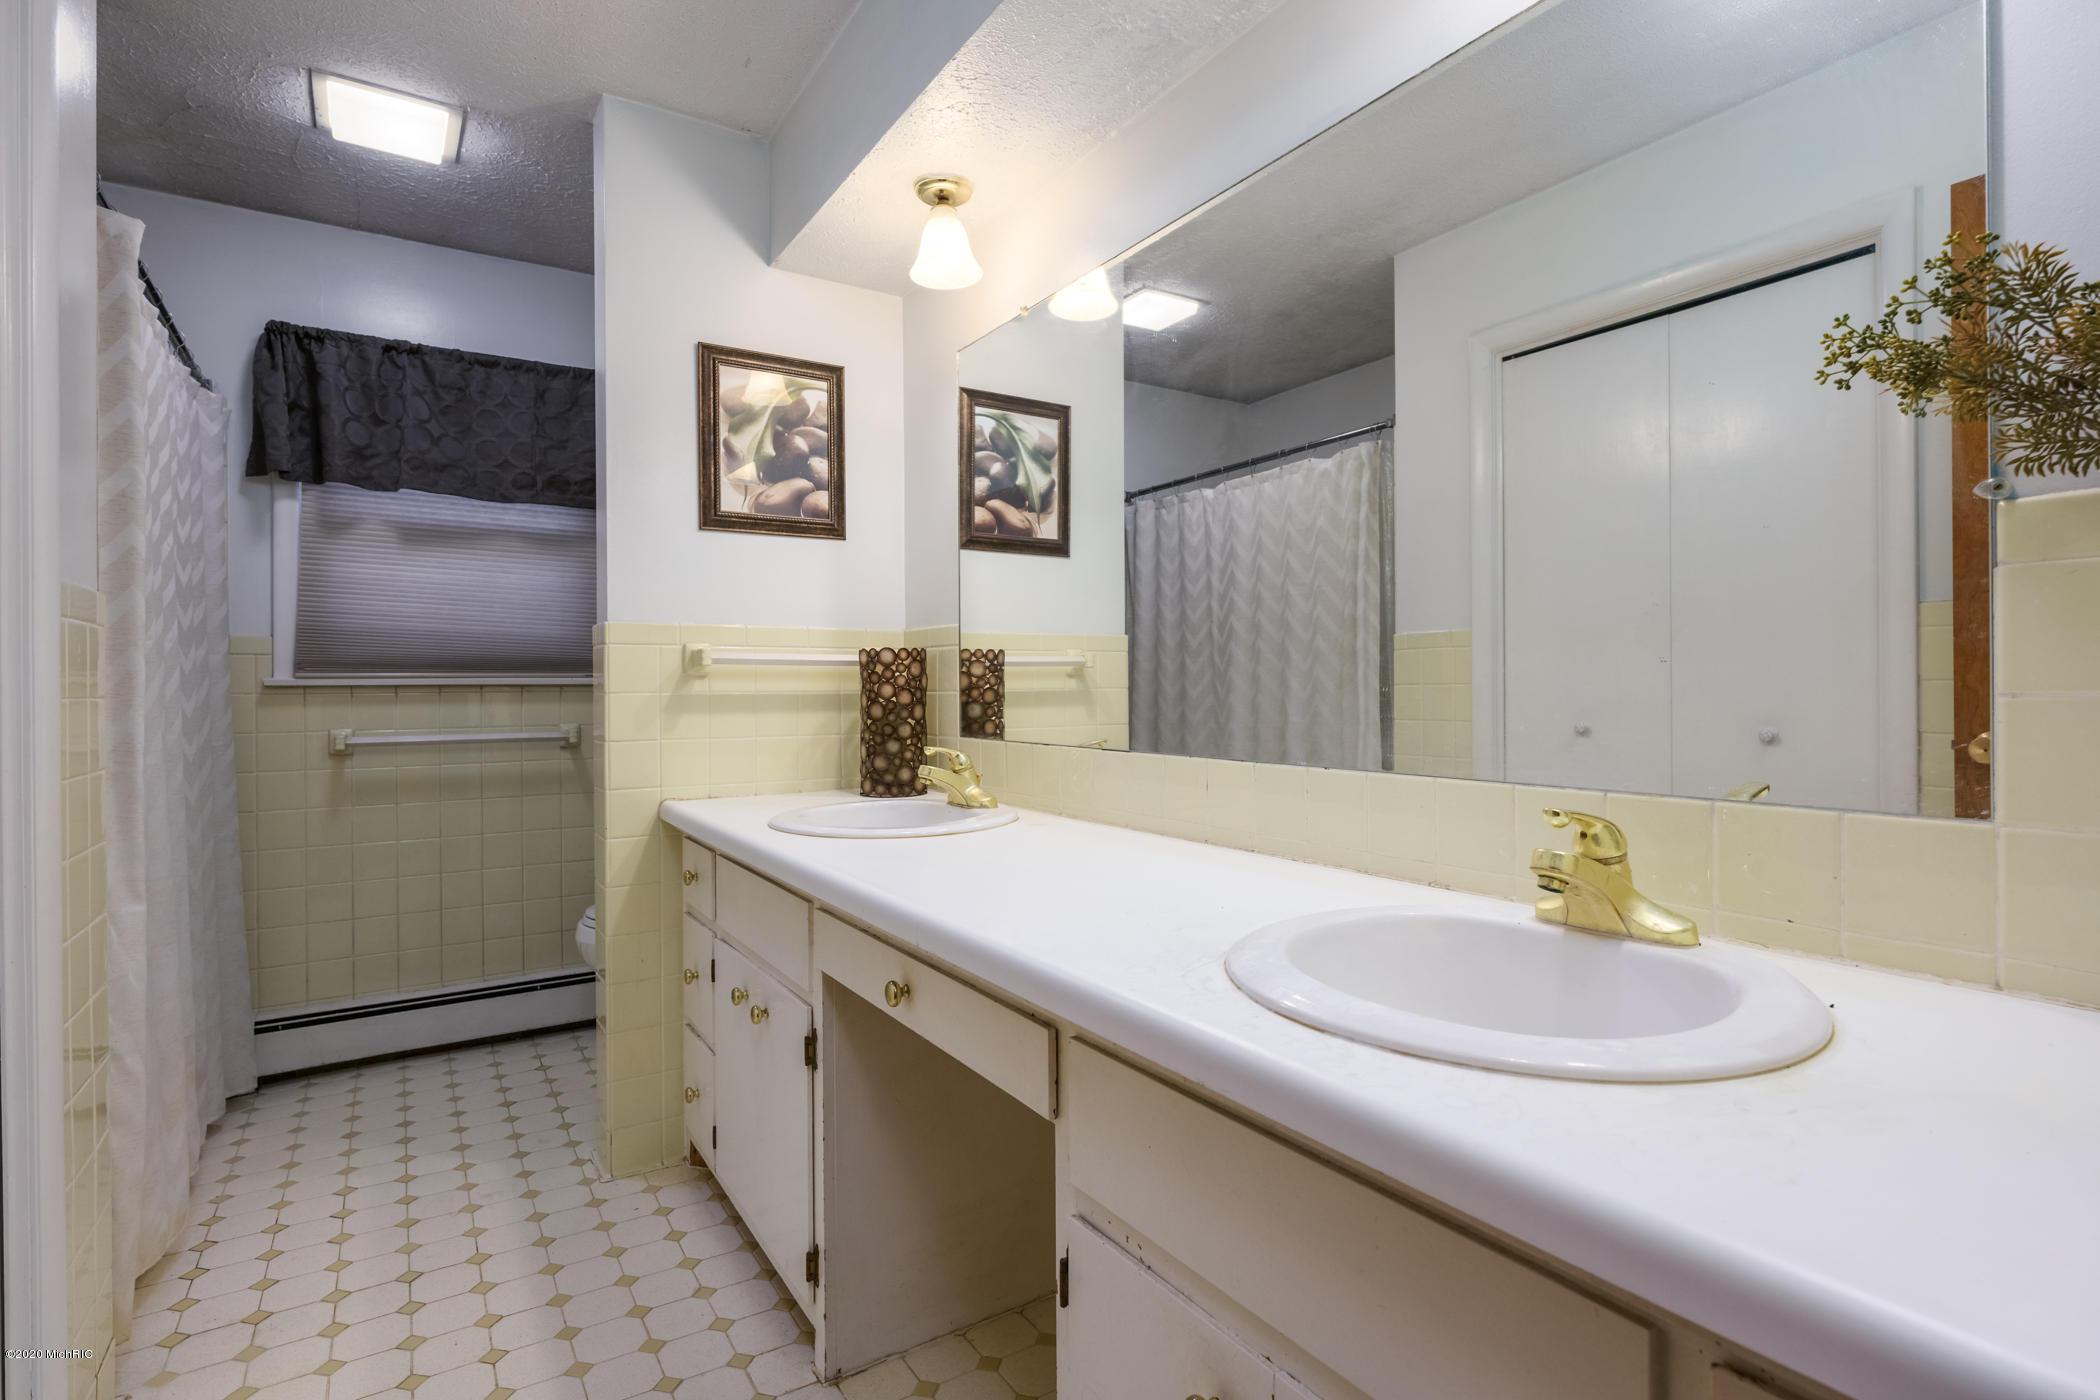 Sold 605 Weaver Avenue Kalamazoo Mi 49006 3 Beds 2 Full Baths 1 Half Bath 214 000 Mls 20044735